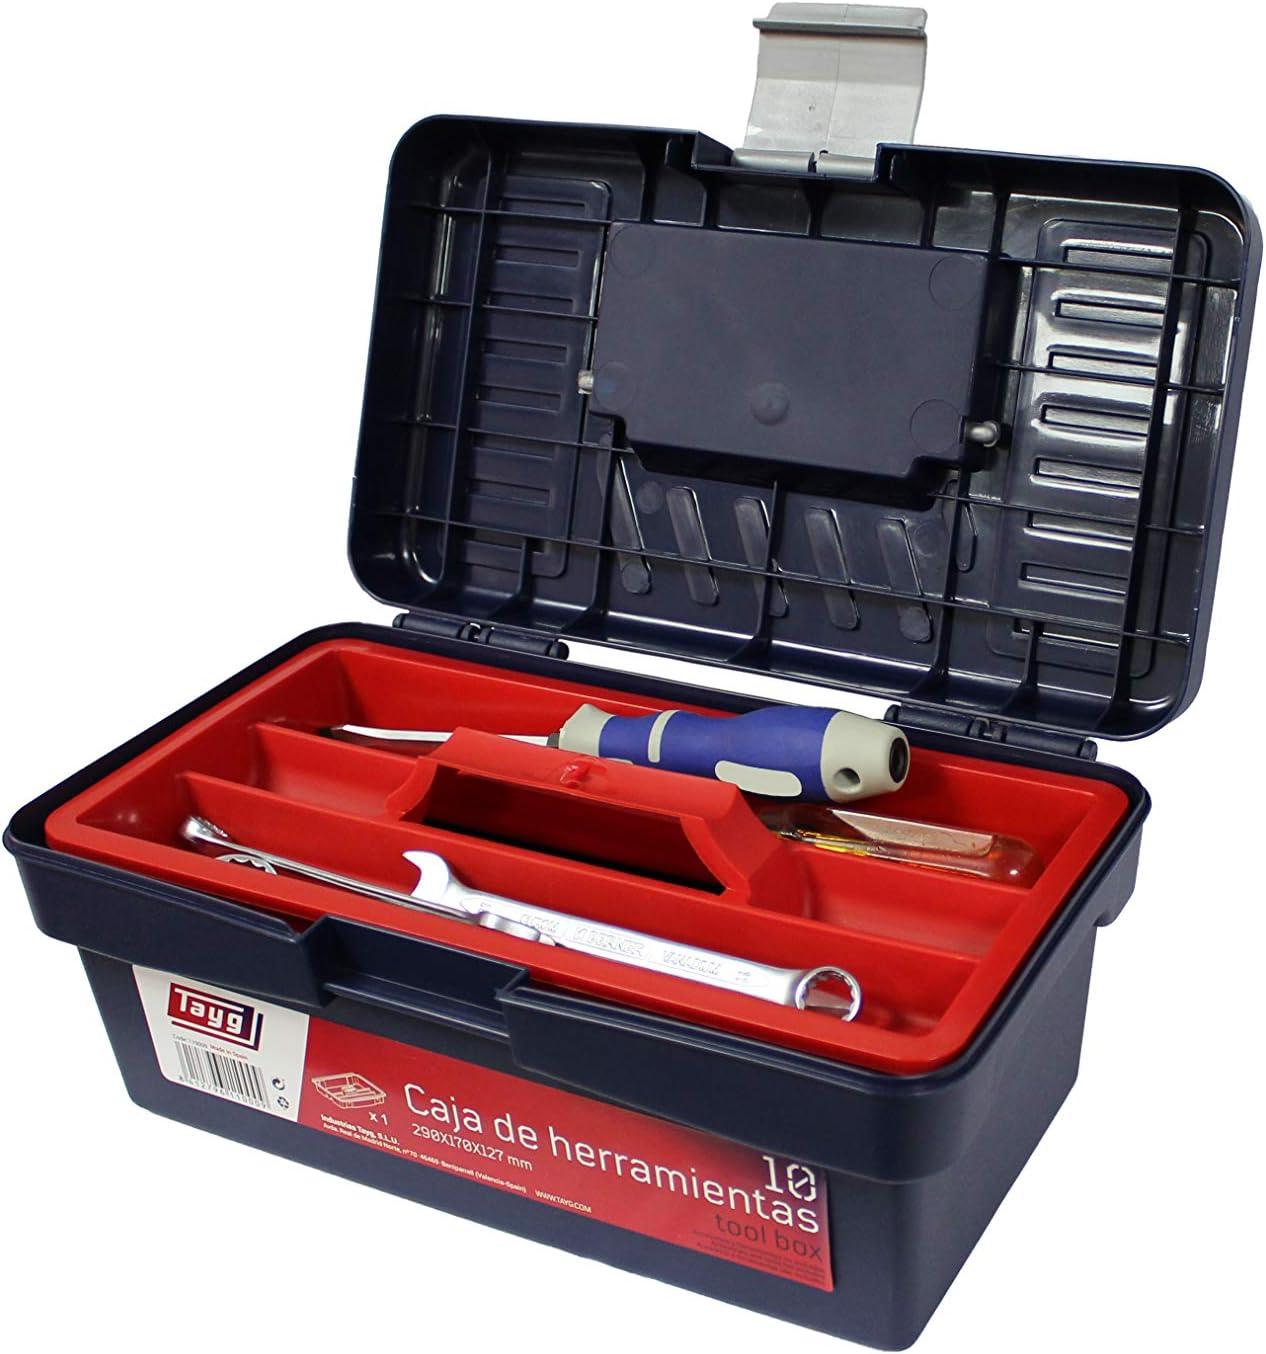 Tayg Caja herramientas plástico n. 10, negro, 290 x 170 x 127 mm ...